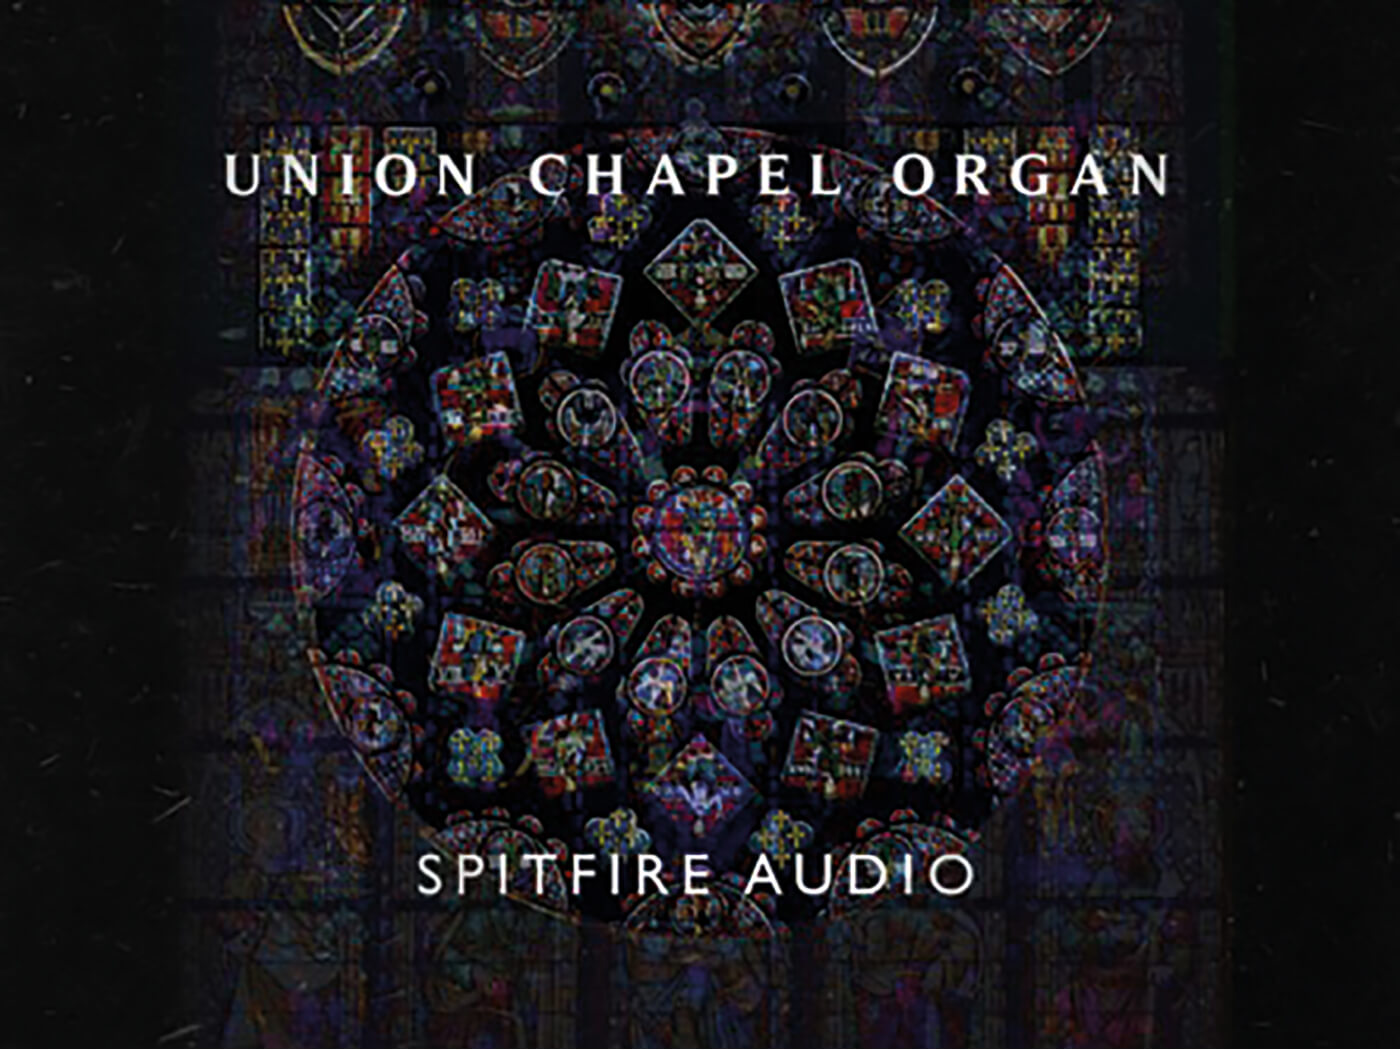 Spitfire Audio Union Chapel Organ